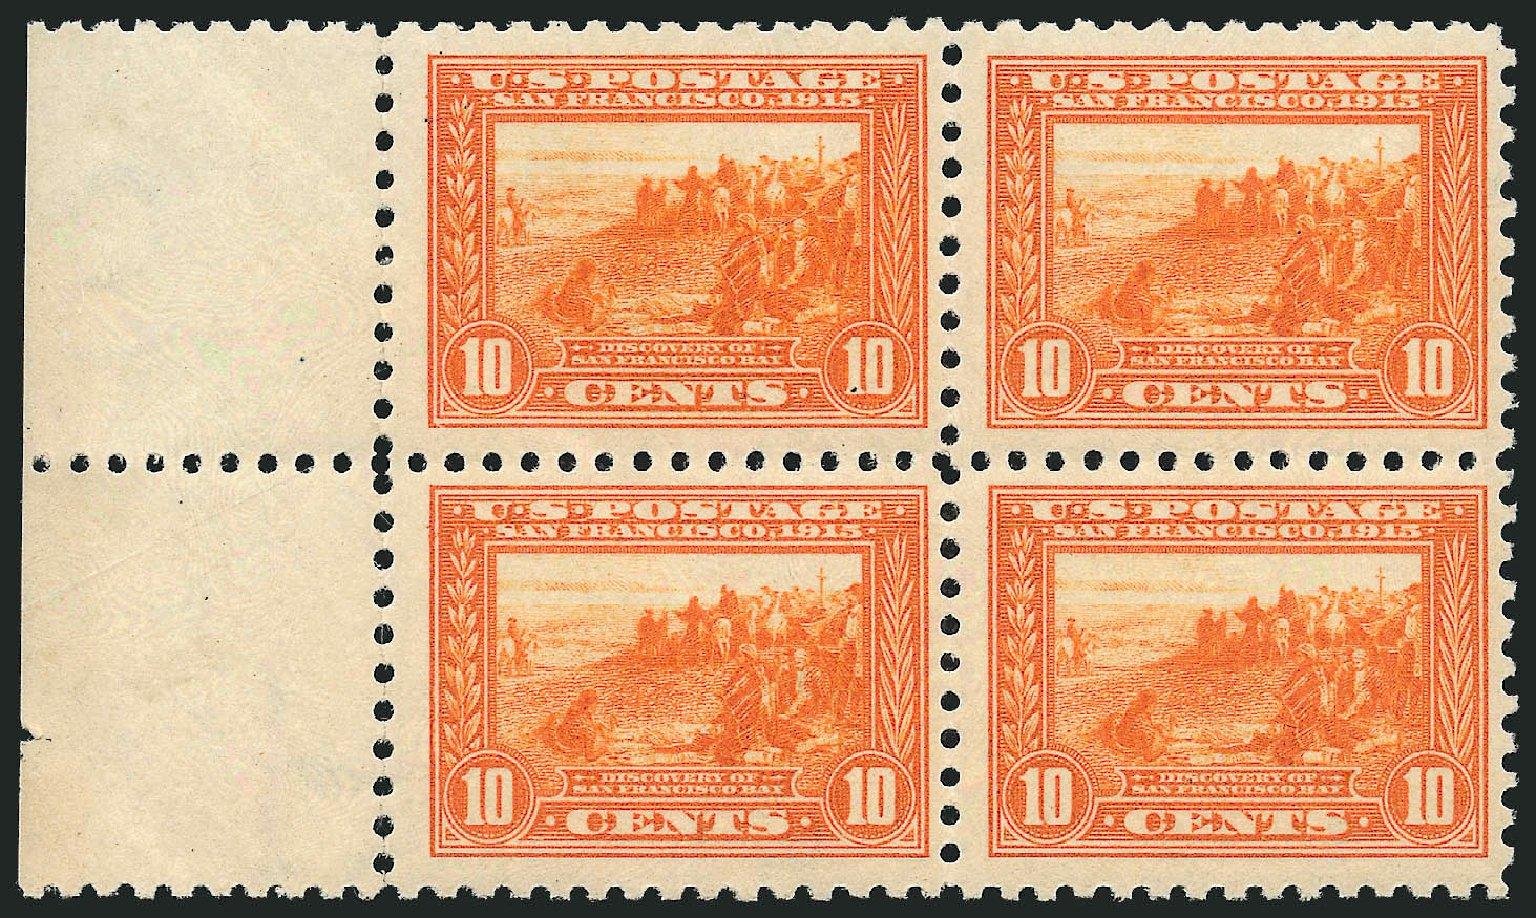 US Stamp Price Scott Catalog #404 - 1915 10c Panama-Pacific Exposition. Robert Siegel Auction Galleries, Apr 2015, Sale 1096, Lot 655